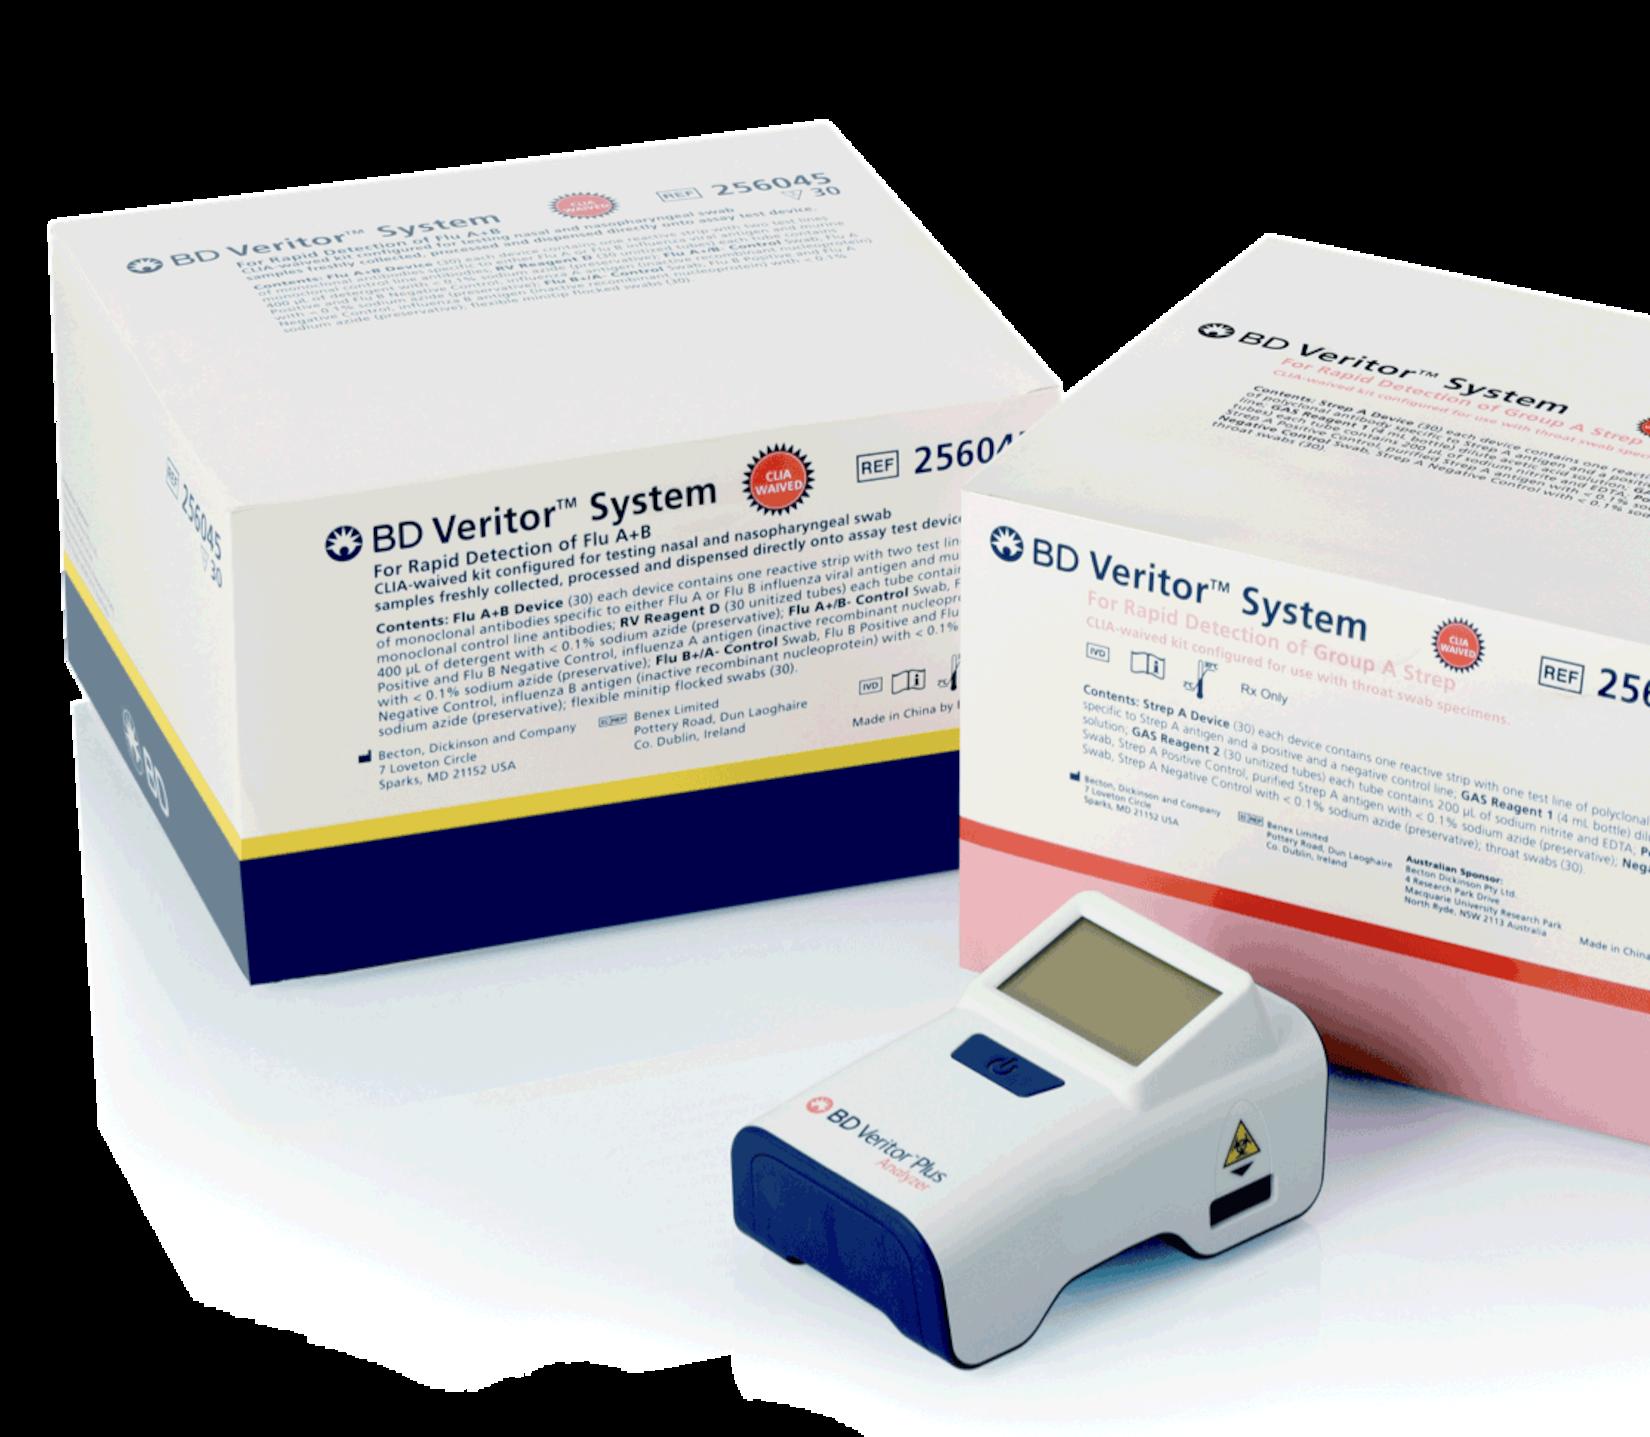 BD Veritor Flu A+B kit, BD Veritor Group A Strep kit, and the BD Veritor Plus Analyzer